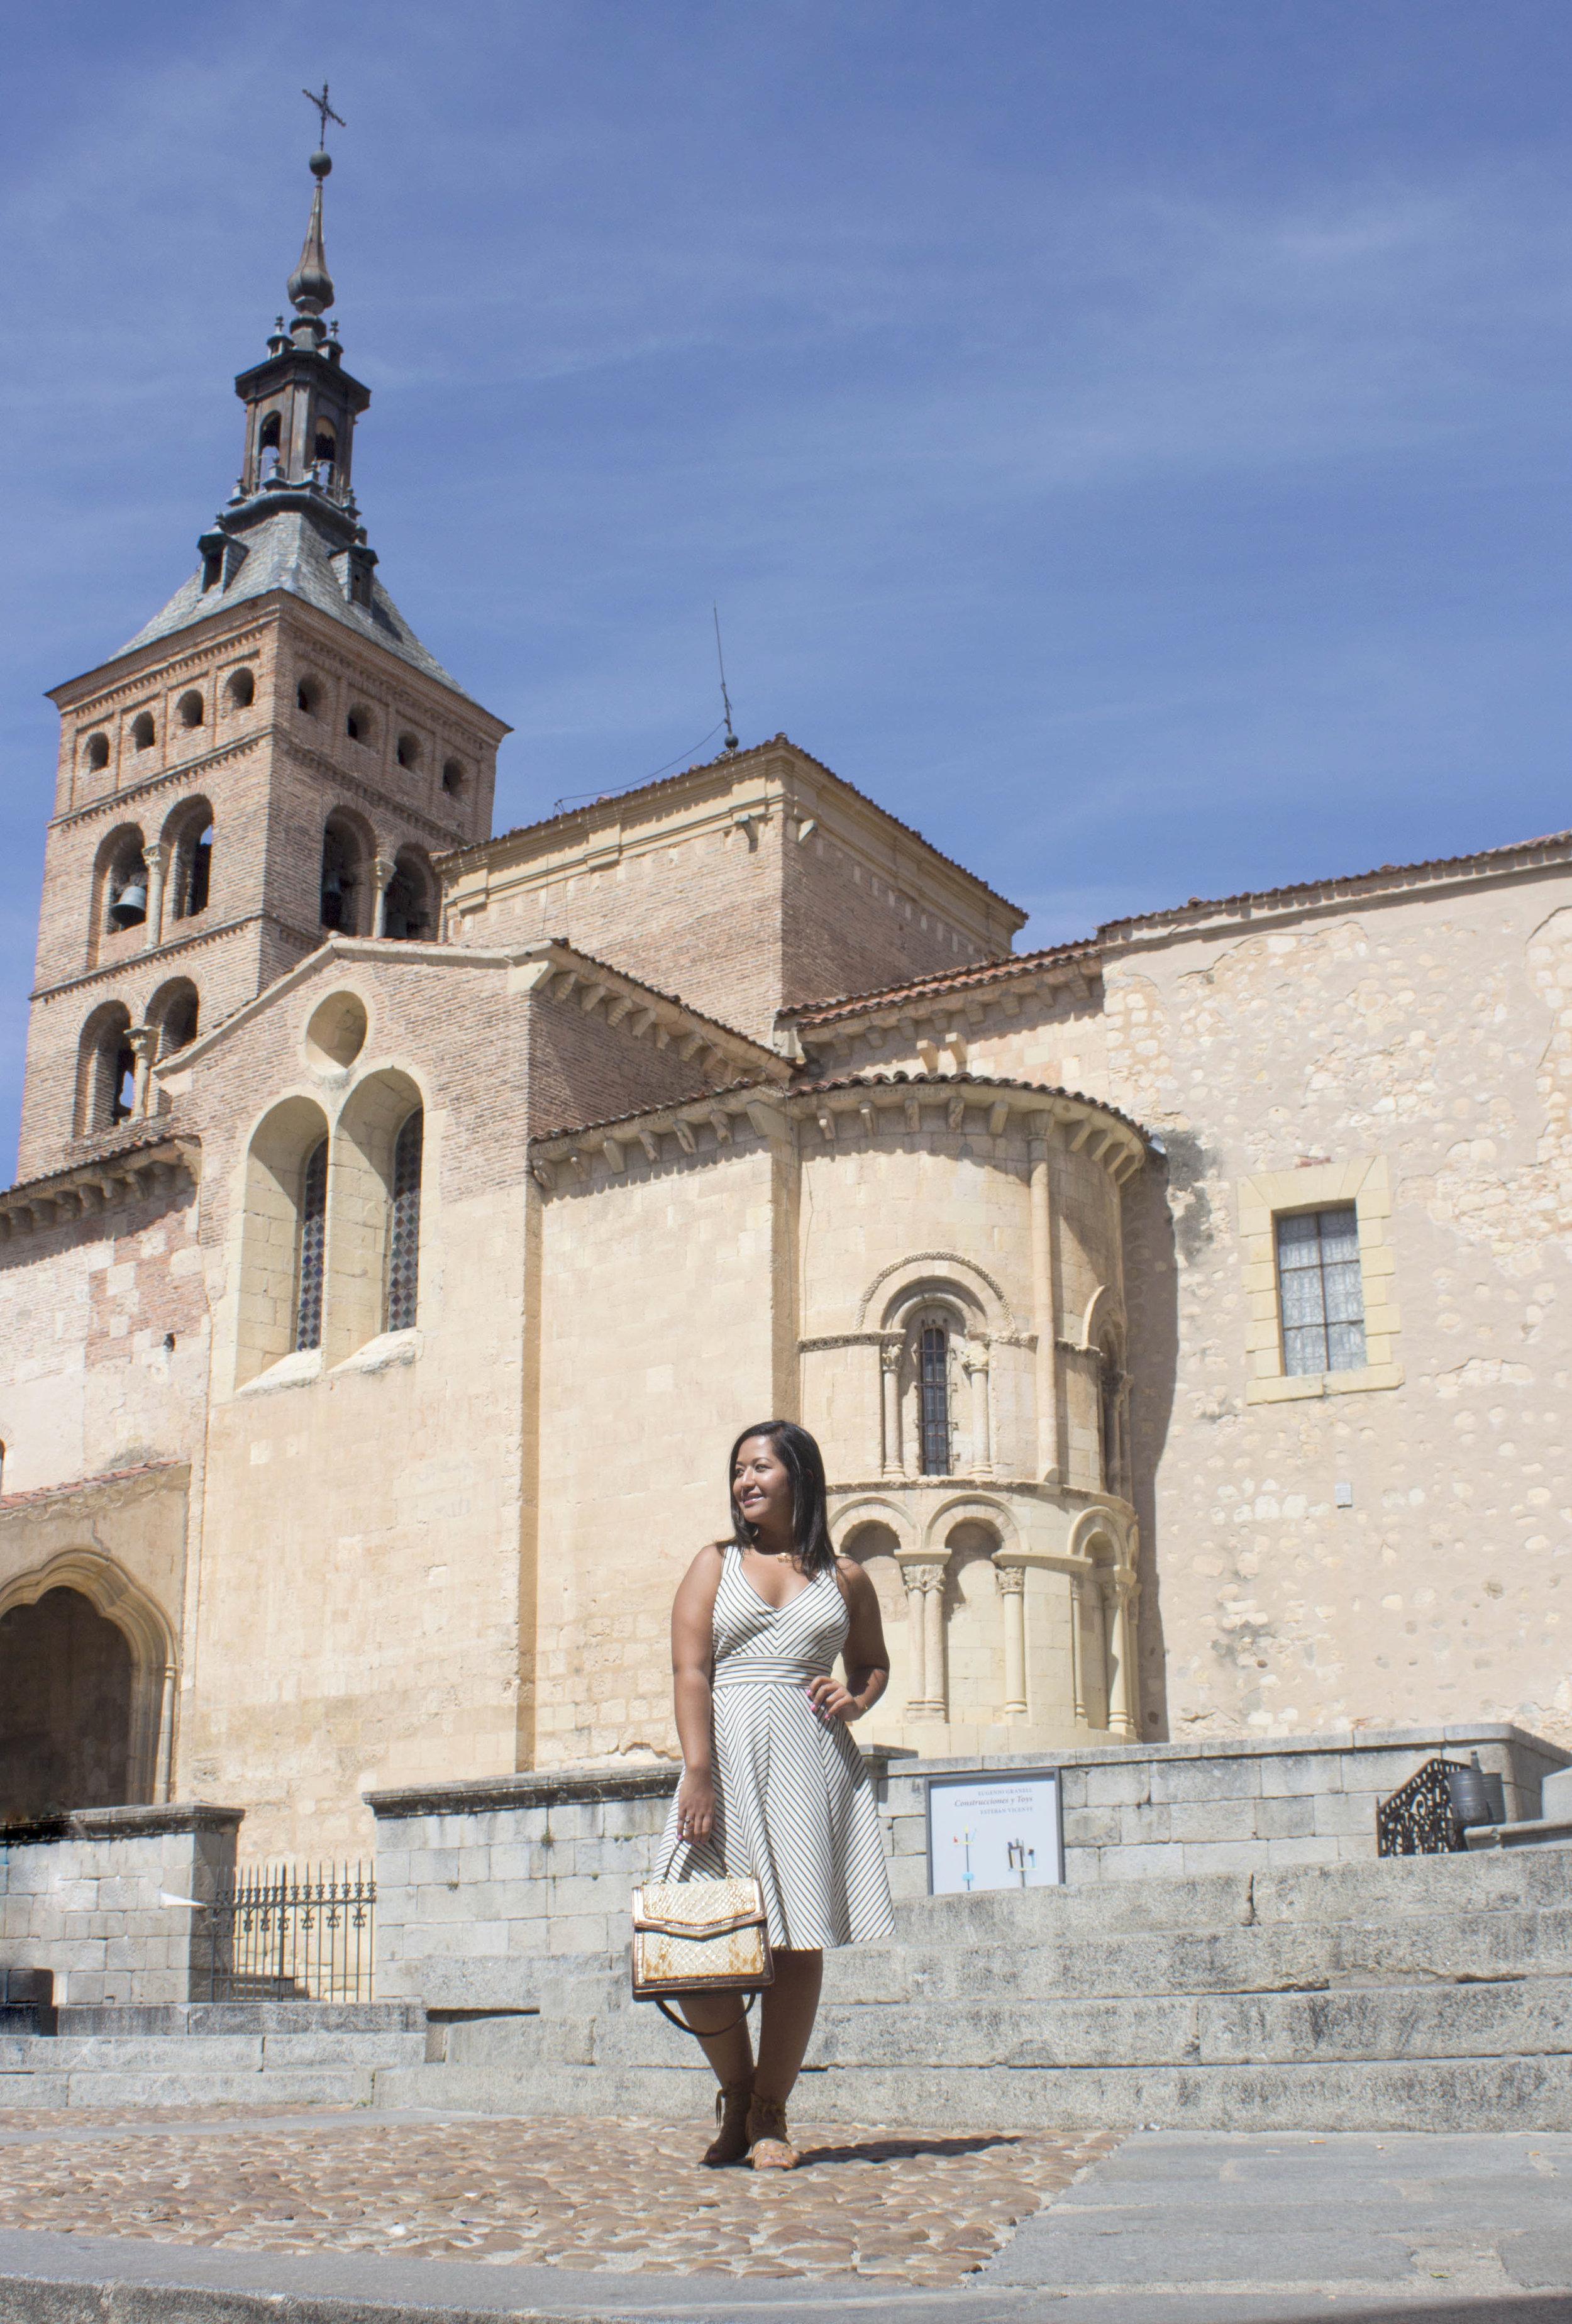 Krity S x Spain 2017 x Segovia x6.jpg